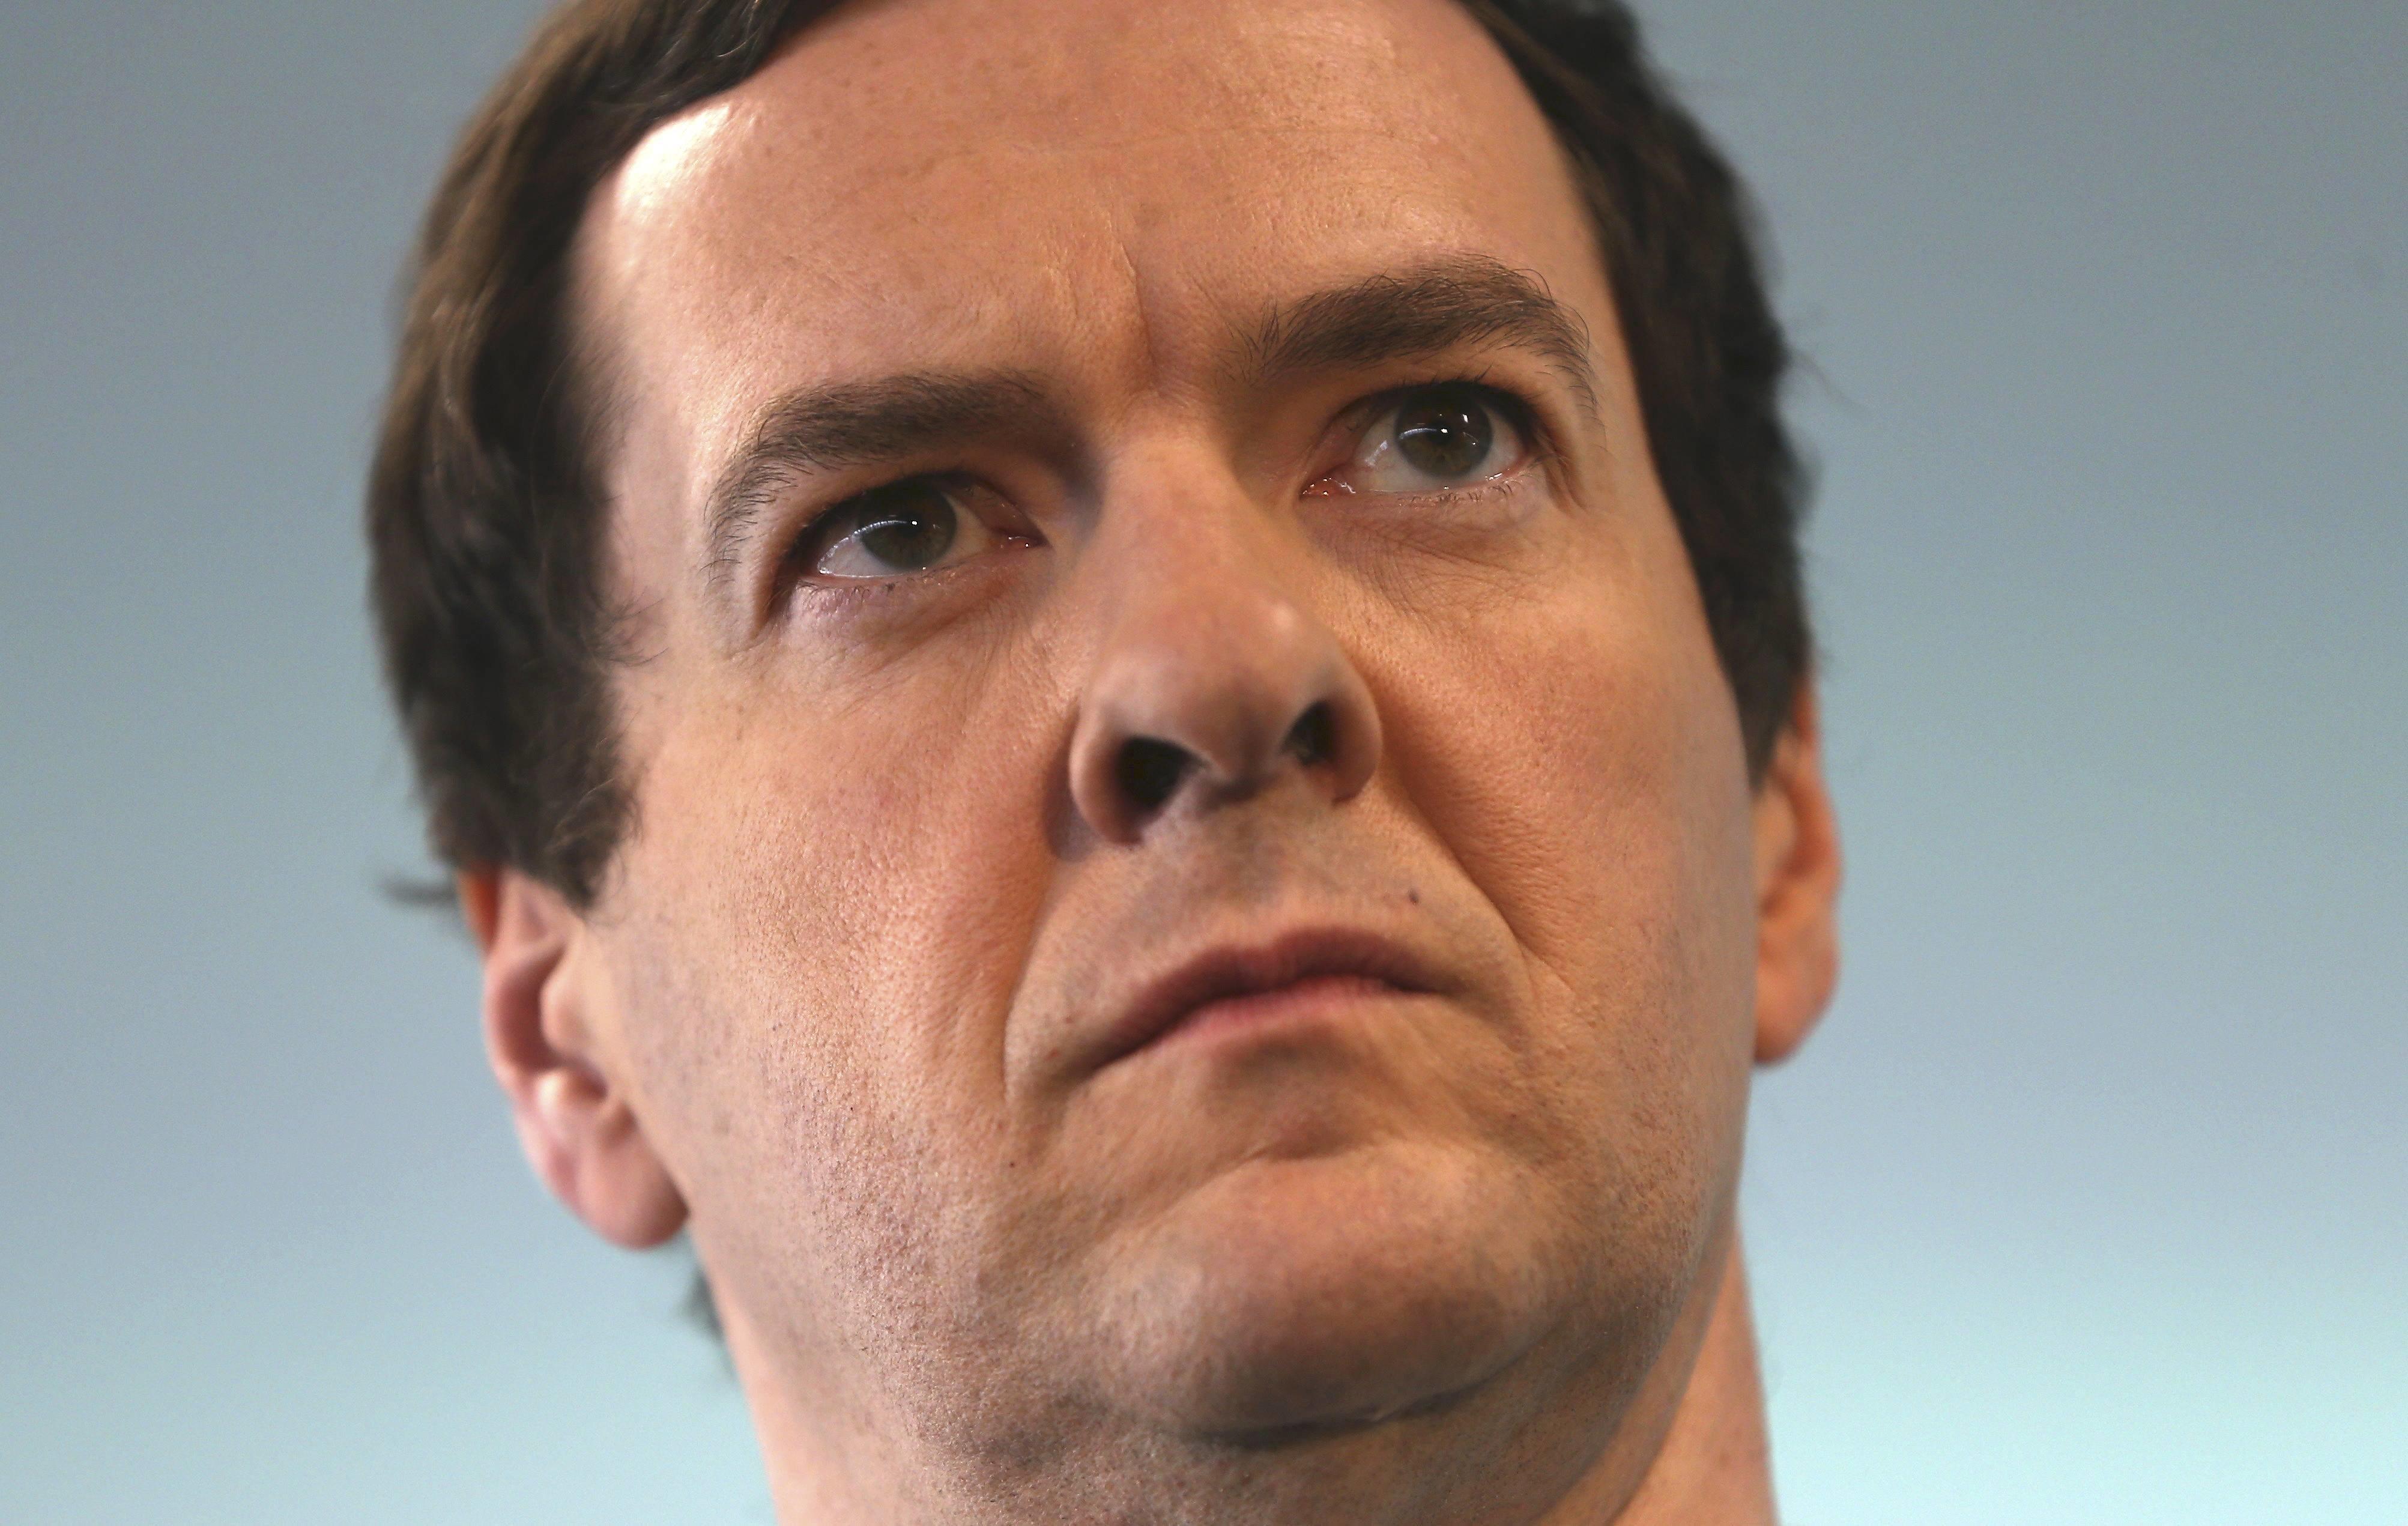 George Osborne Admits He Was 'Always Quite Gloomy' About The EU